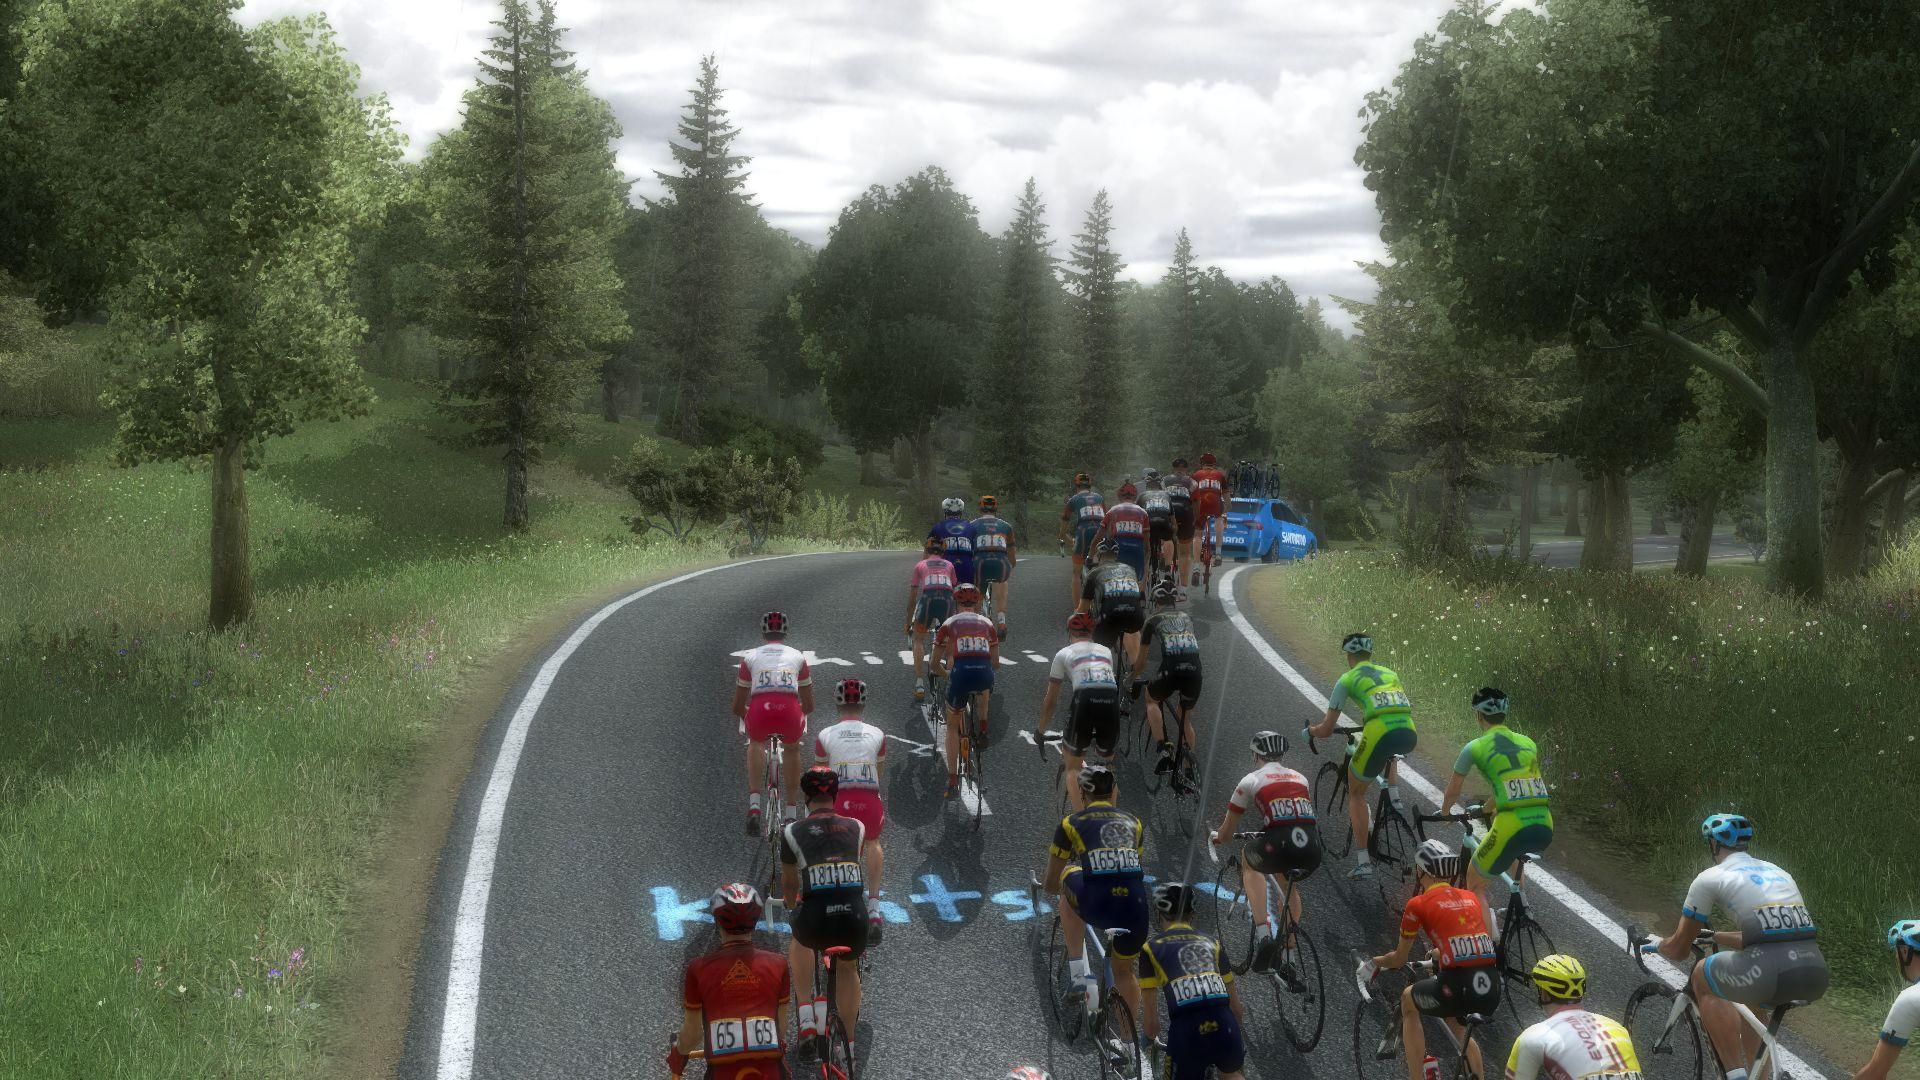 pcmdaily.com/images/mg/2020/Reports/GTM/Giro/S20/mg20_giro_s20_018.jpg